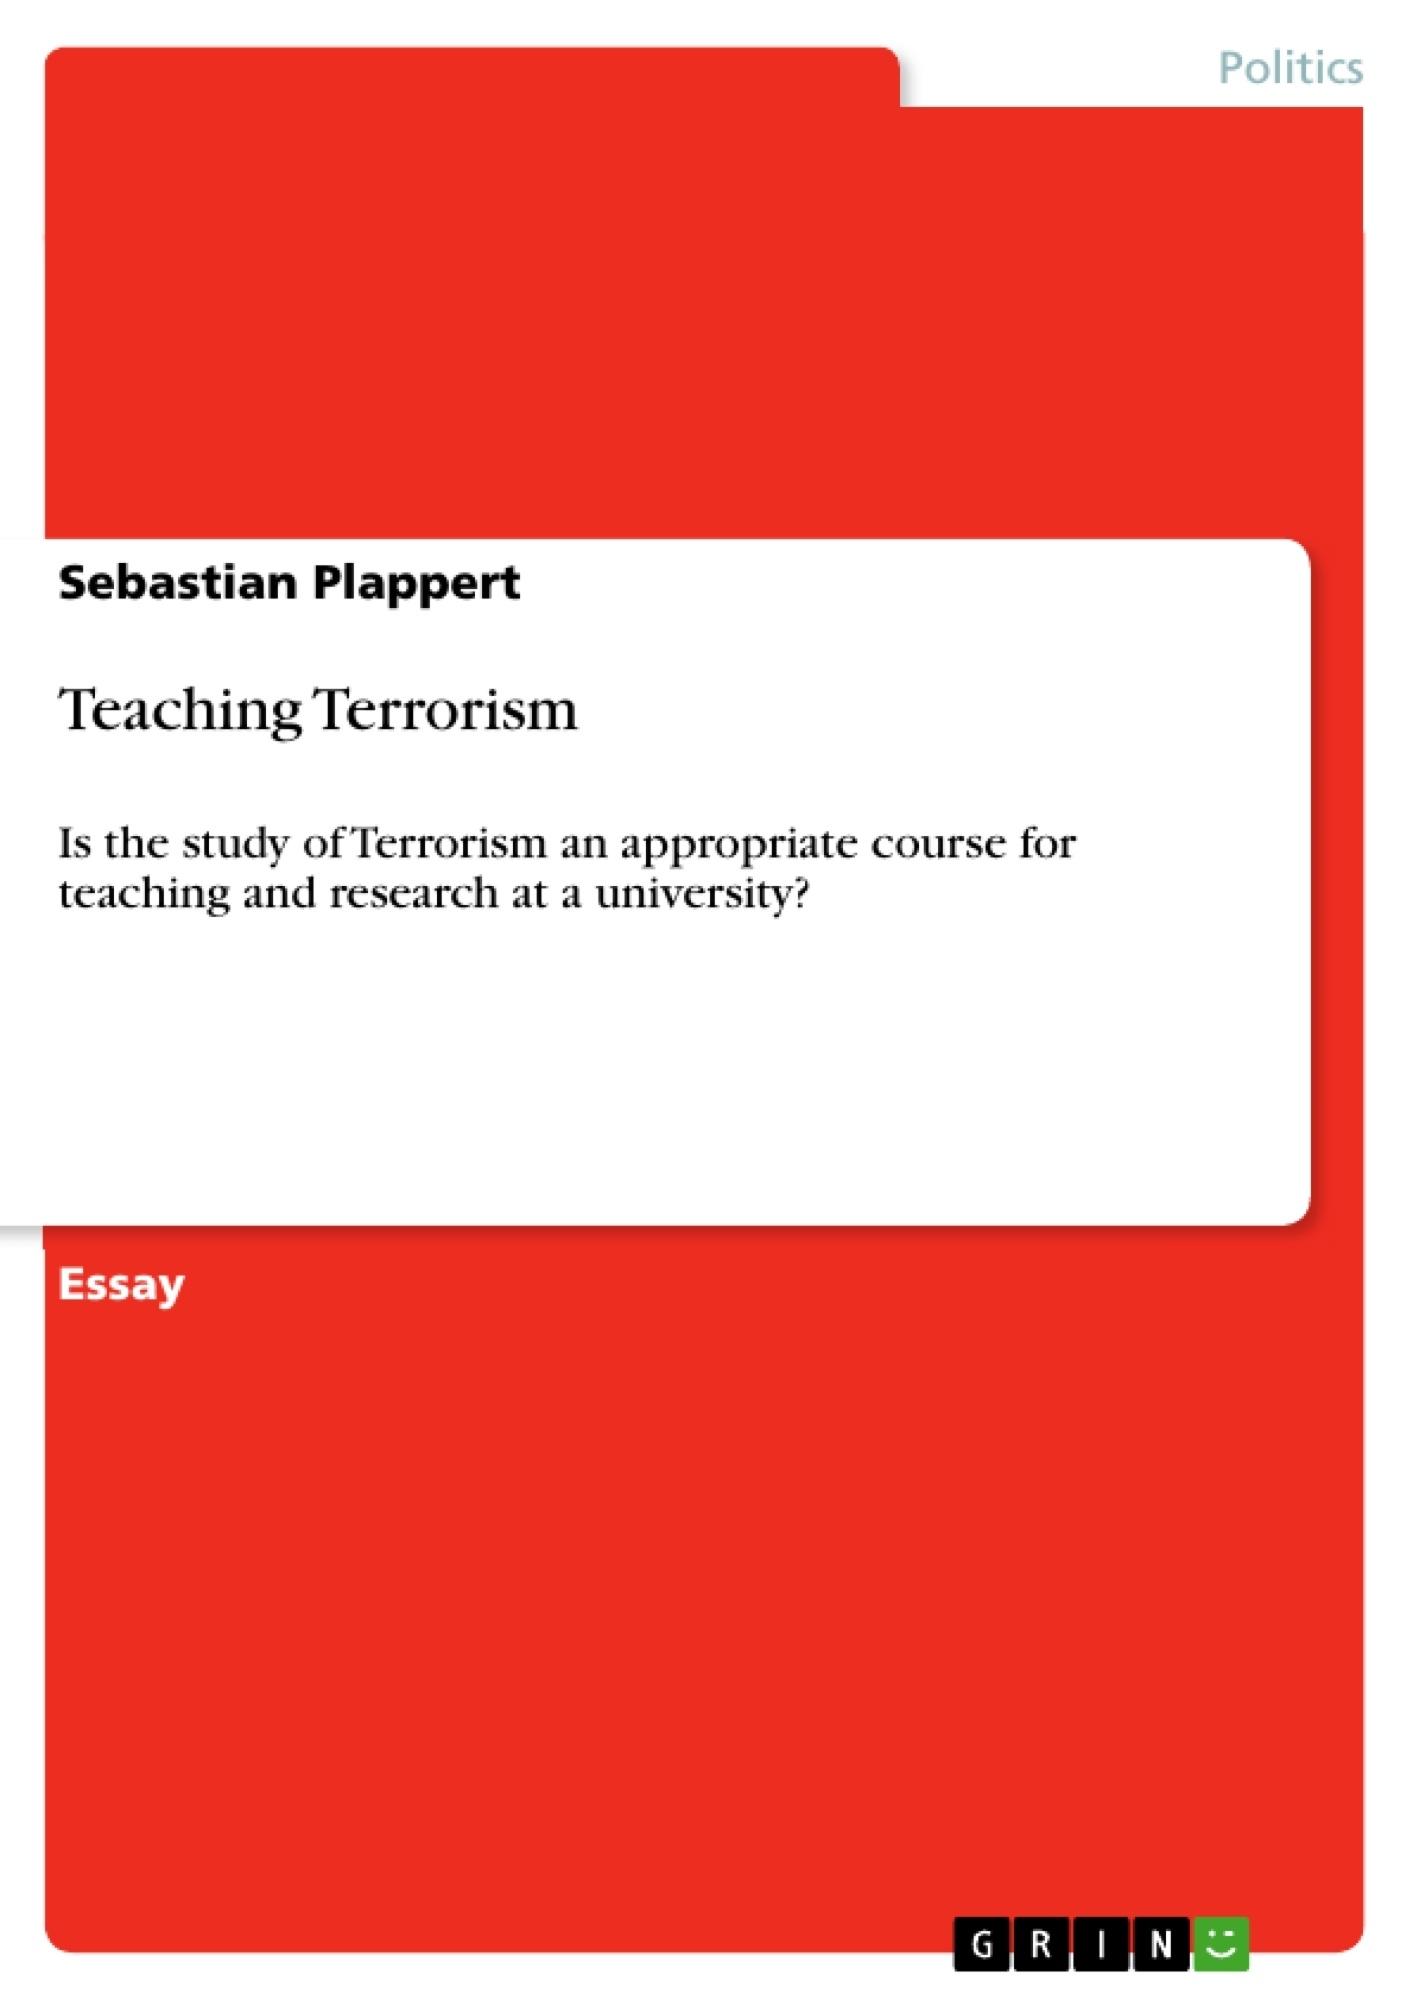 Title: Teaching Terrorism